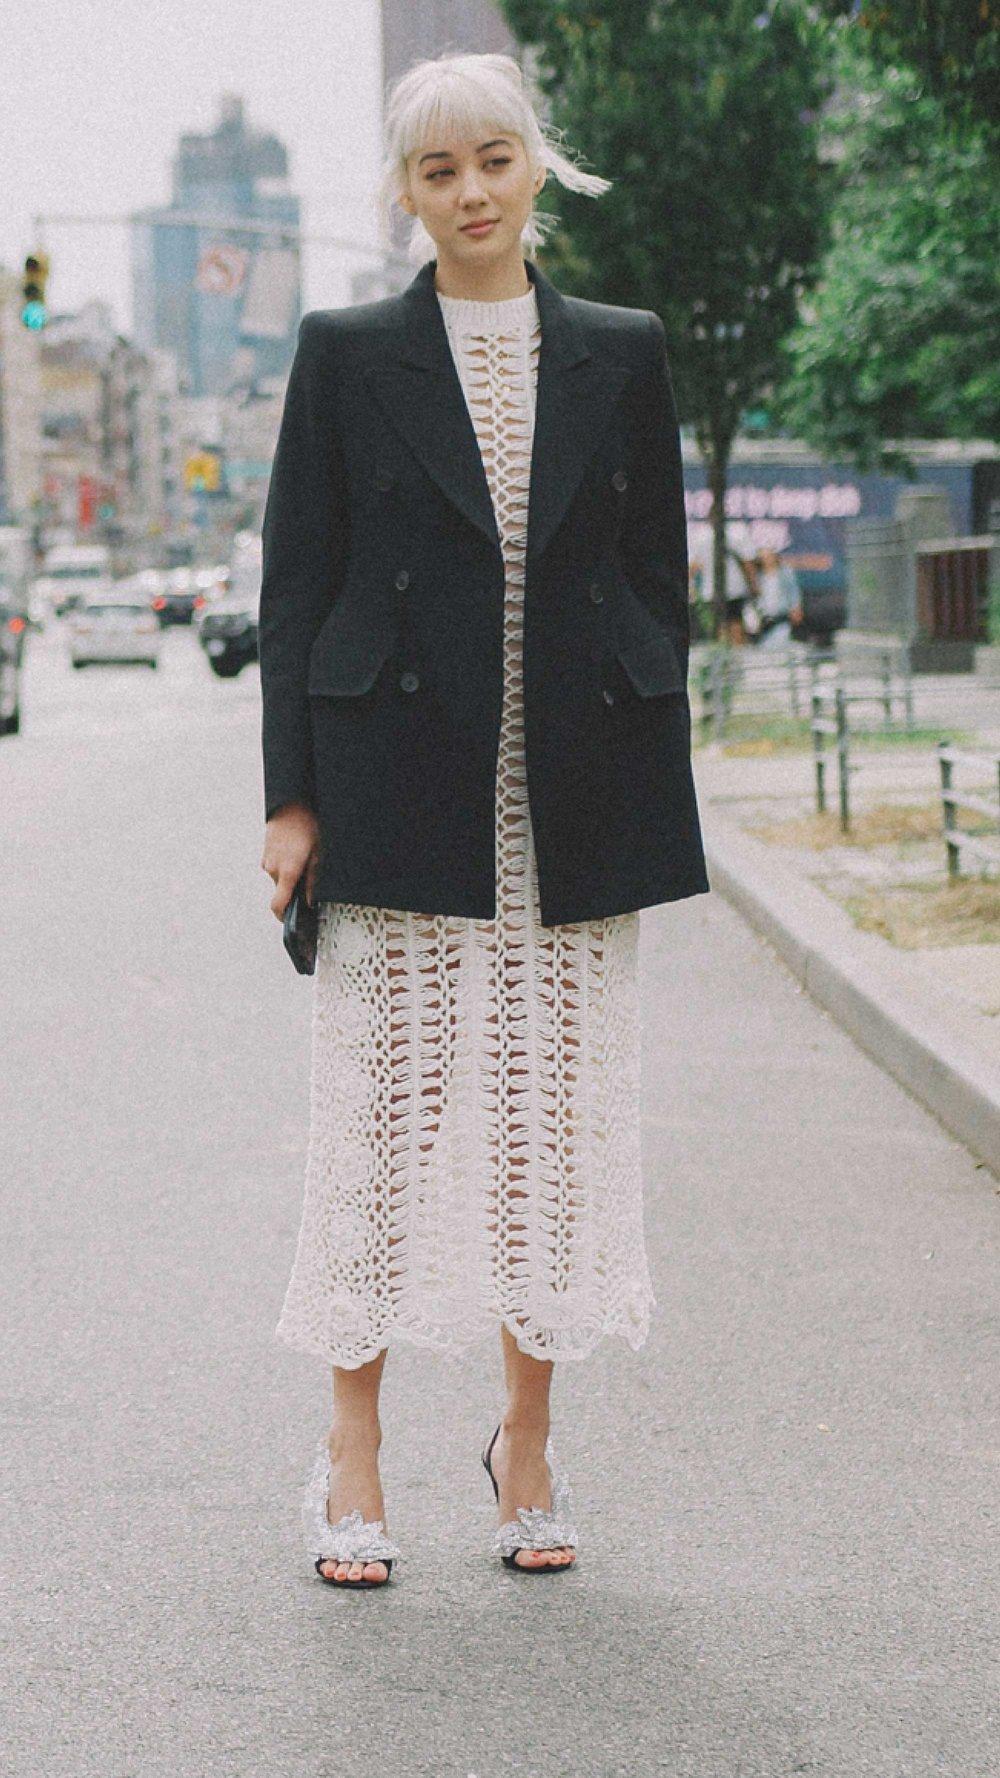 New-York-Fashion-Week-NYFW-SS18-street-style-day-three-SS186.jpg